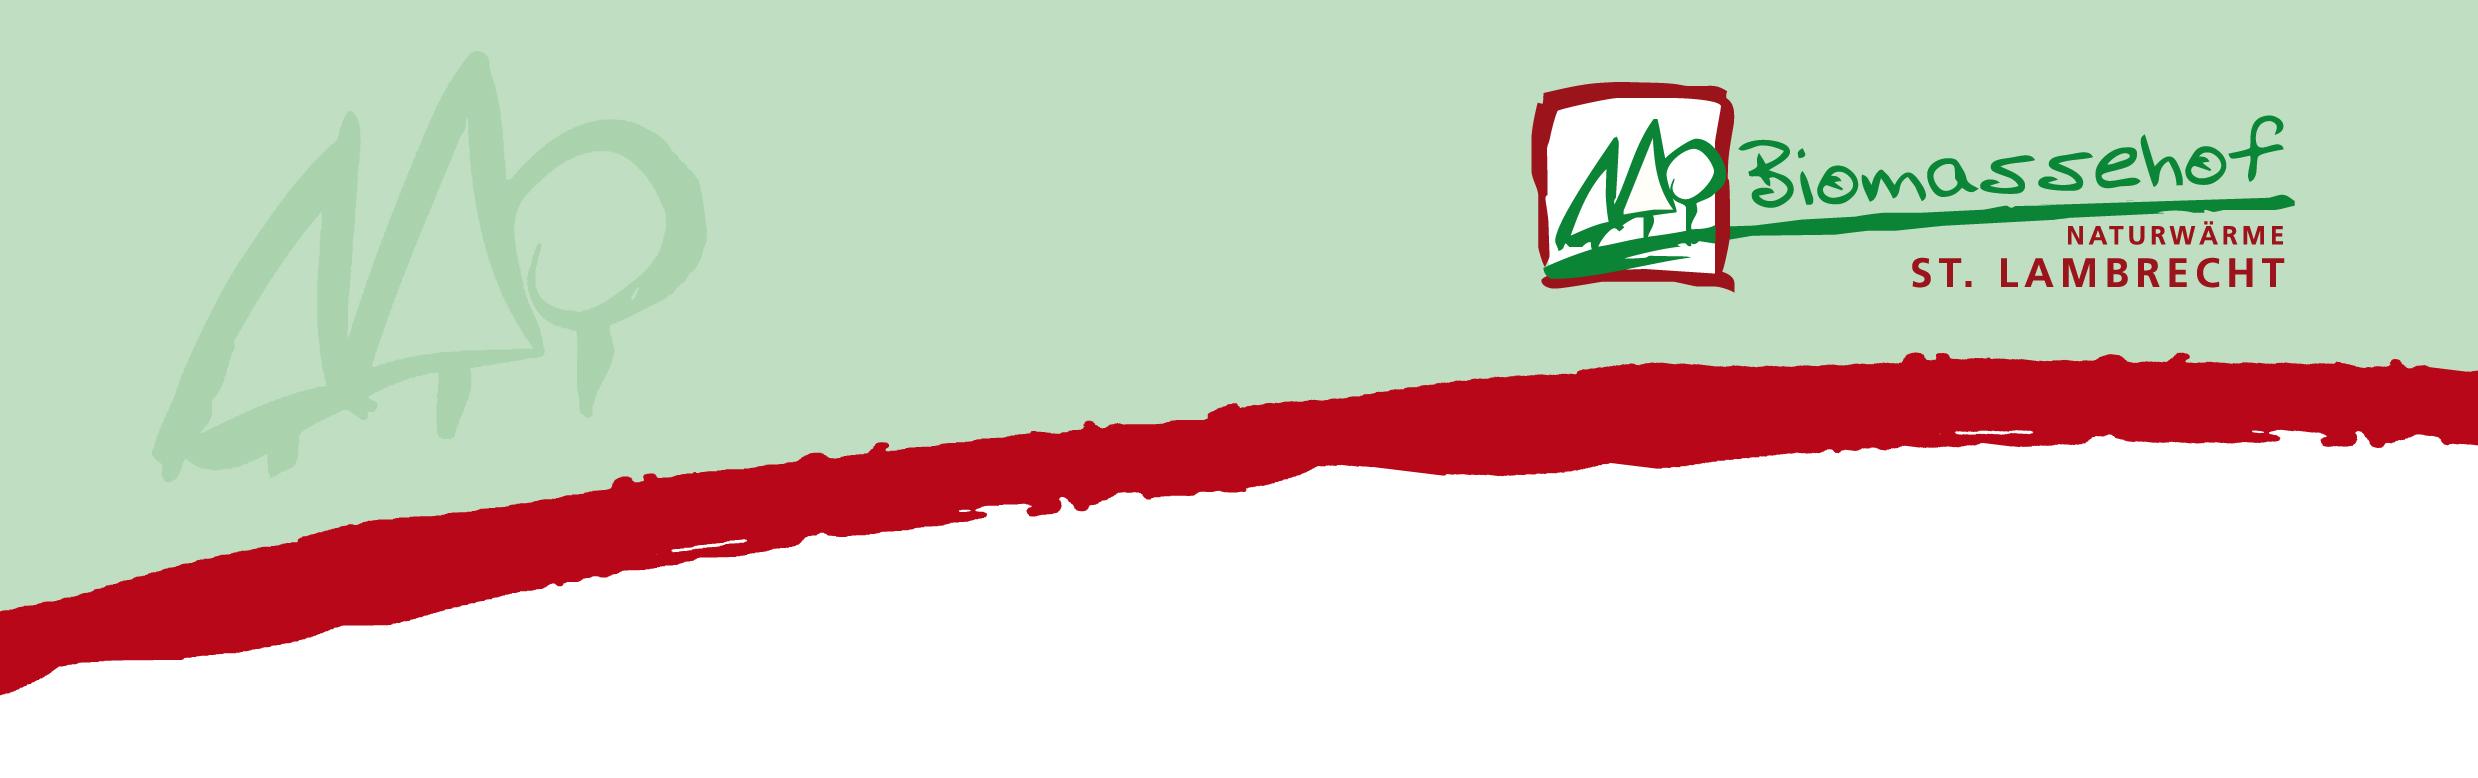 Logo Fernwärme St Lambrecht Briefkopf